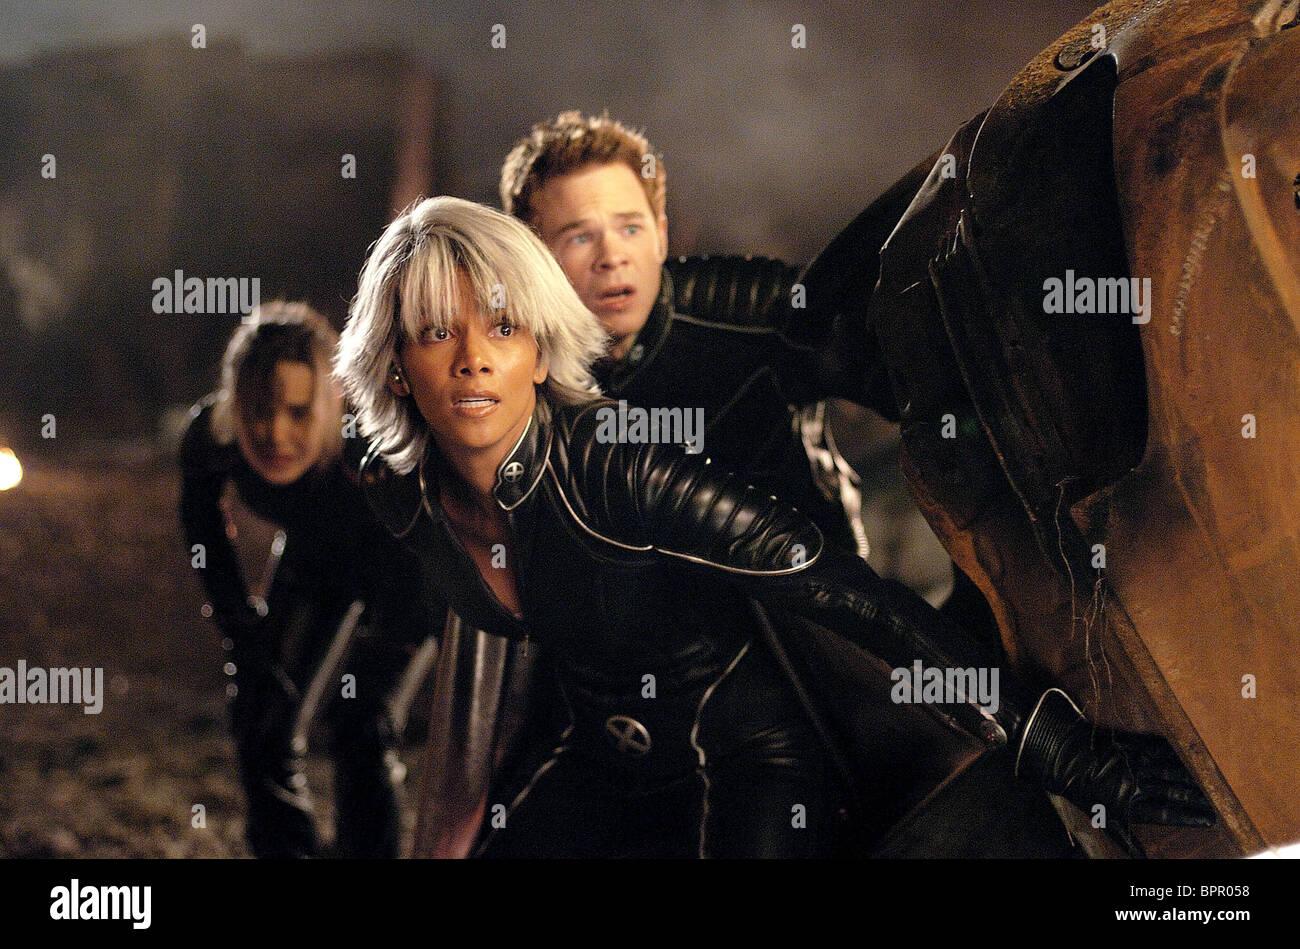 Ellen Page Halle Berry Shawn Ashmore X Men The Last Stand X Men Stock Photo Alamy